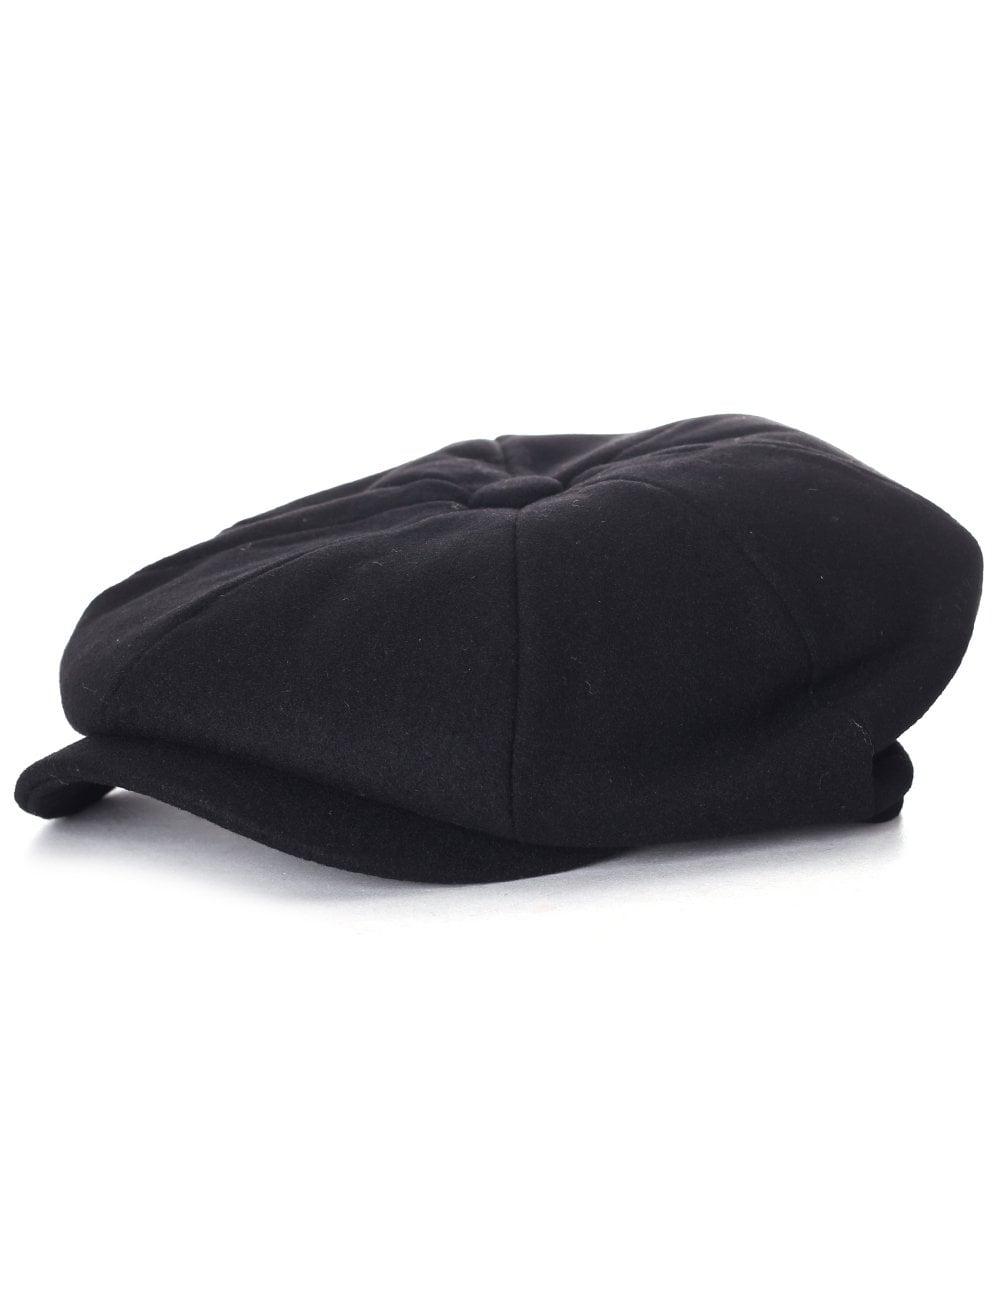 cb0f9e17923 Barbour Men s Melton Bakerboy Hat